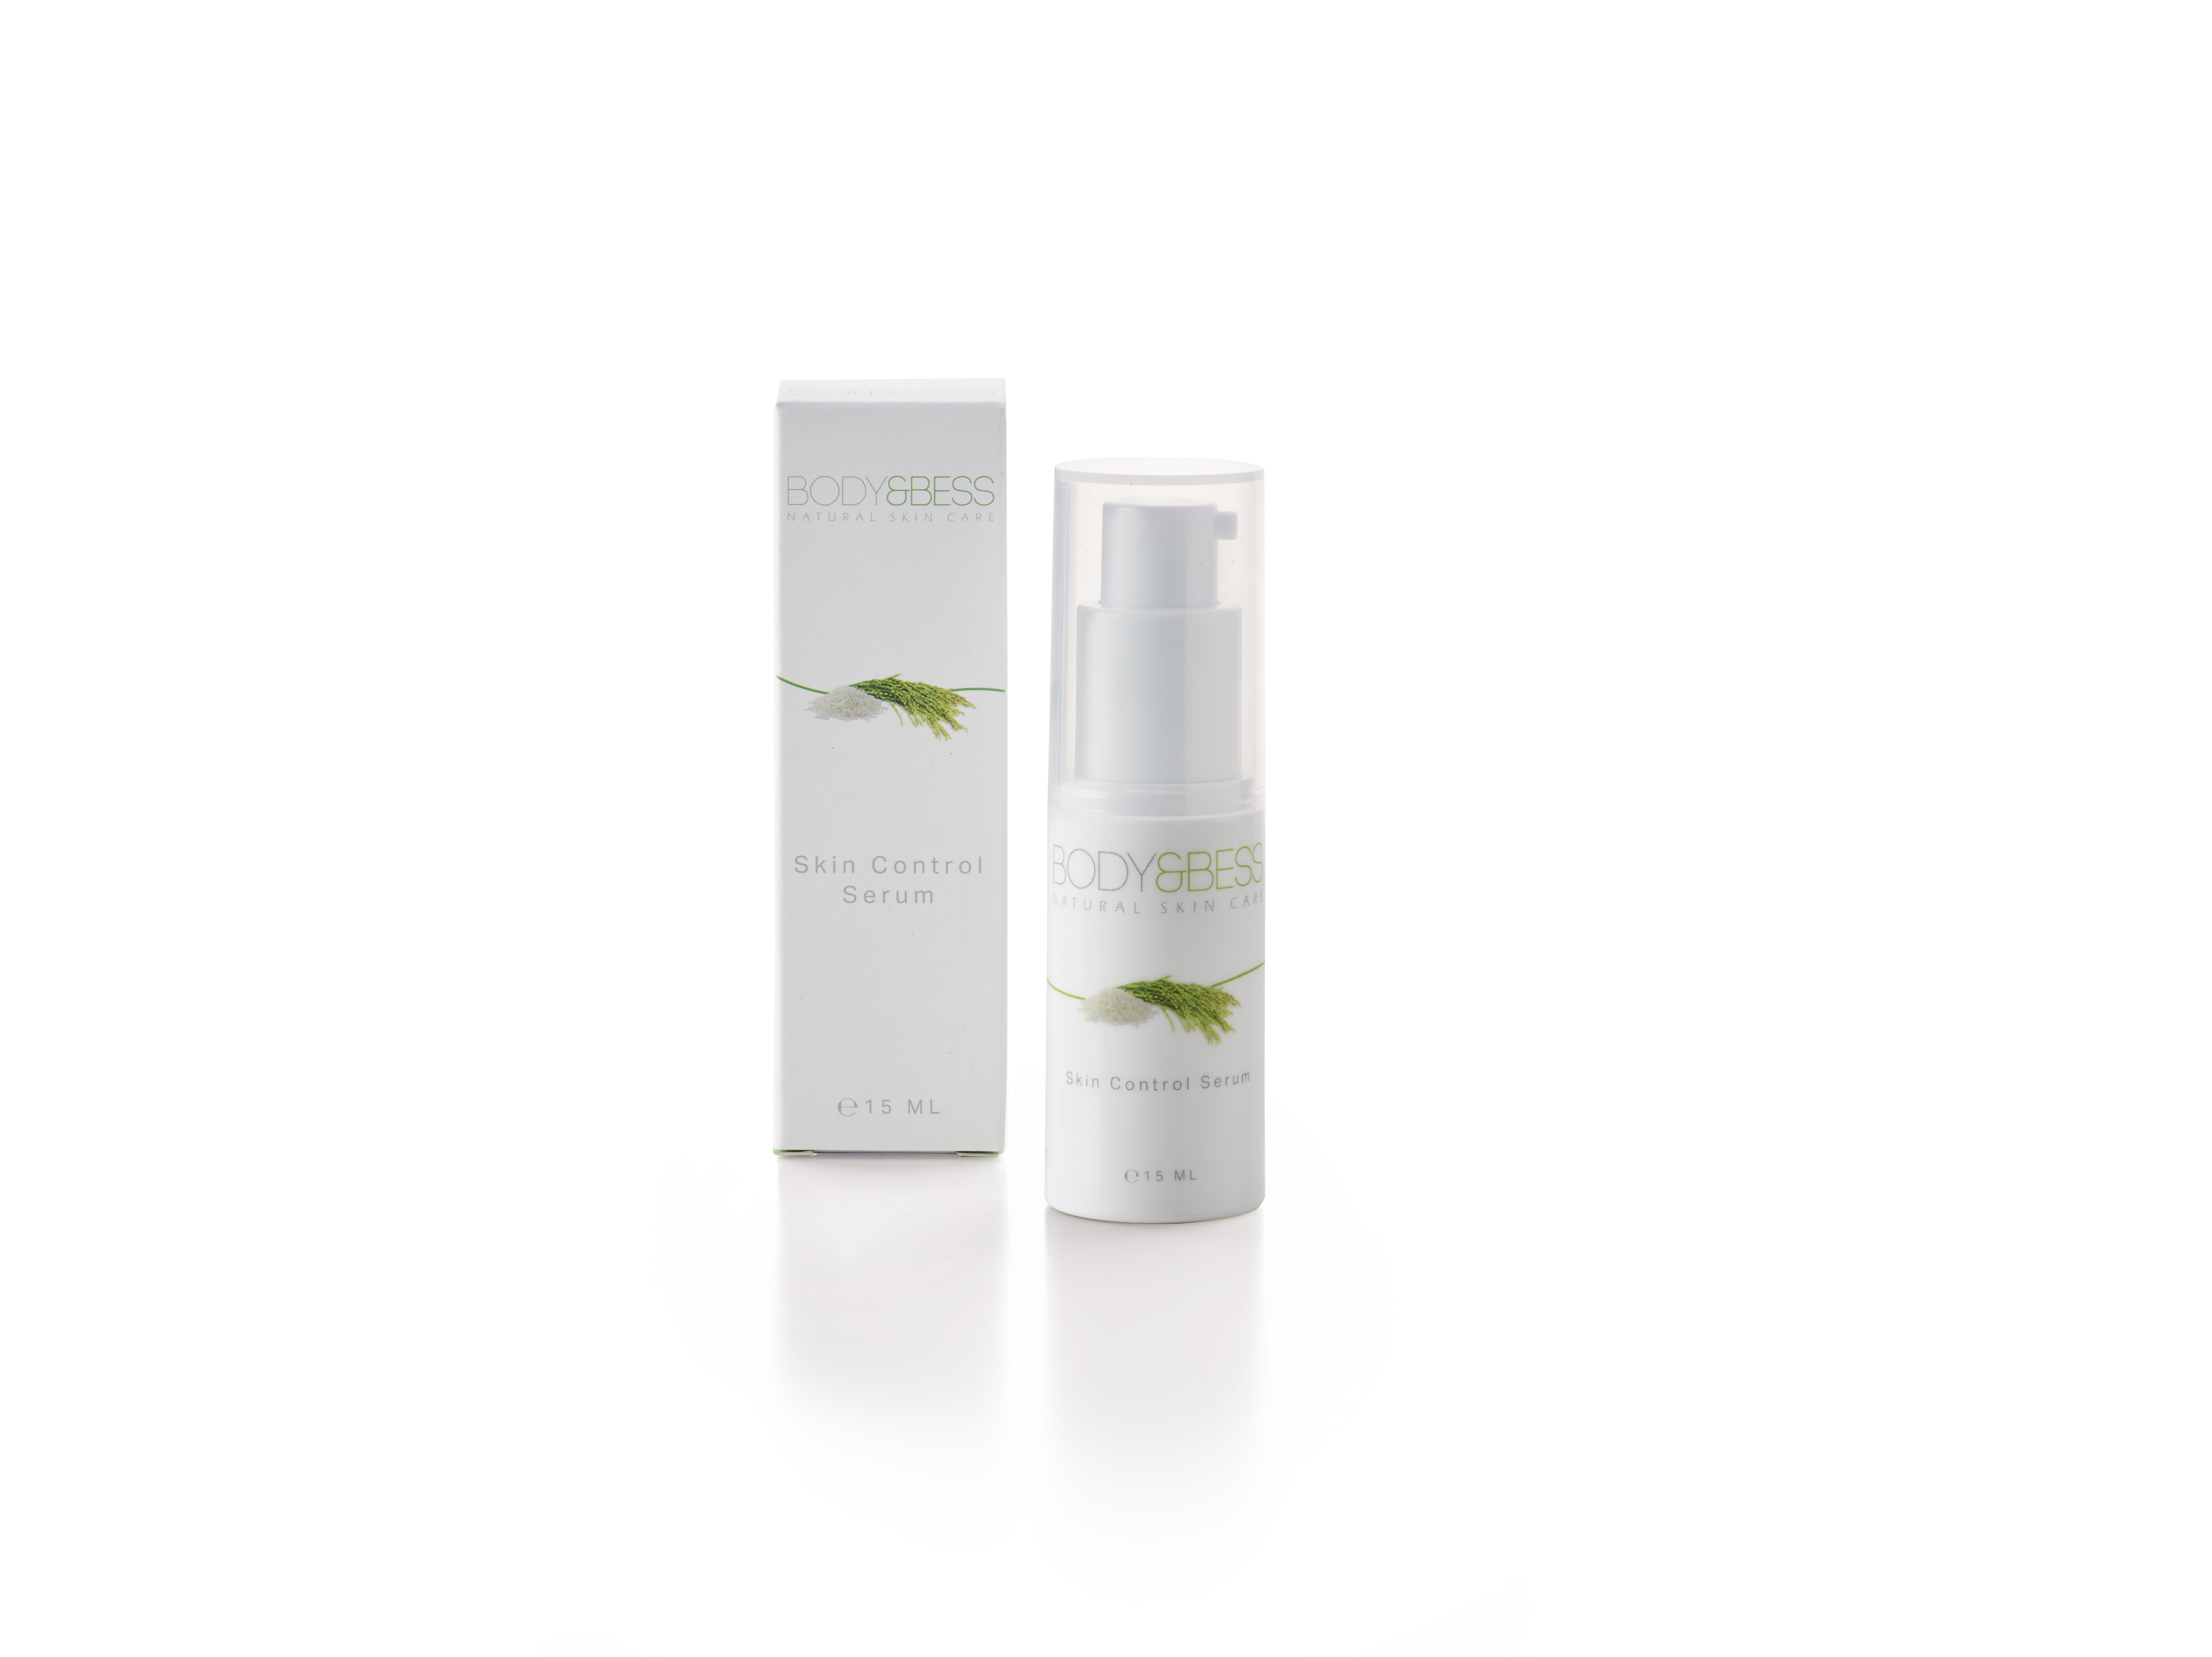 Body & Bess - Skin Control Serum 15ml | SKINside